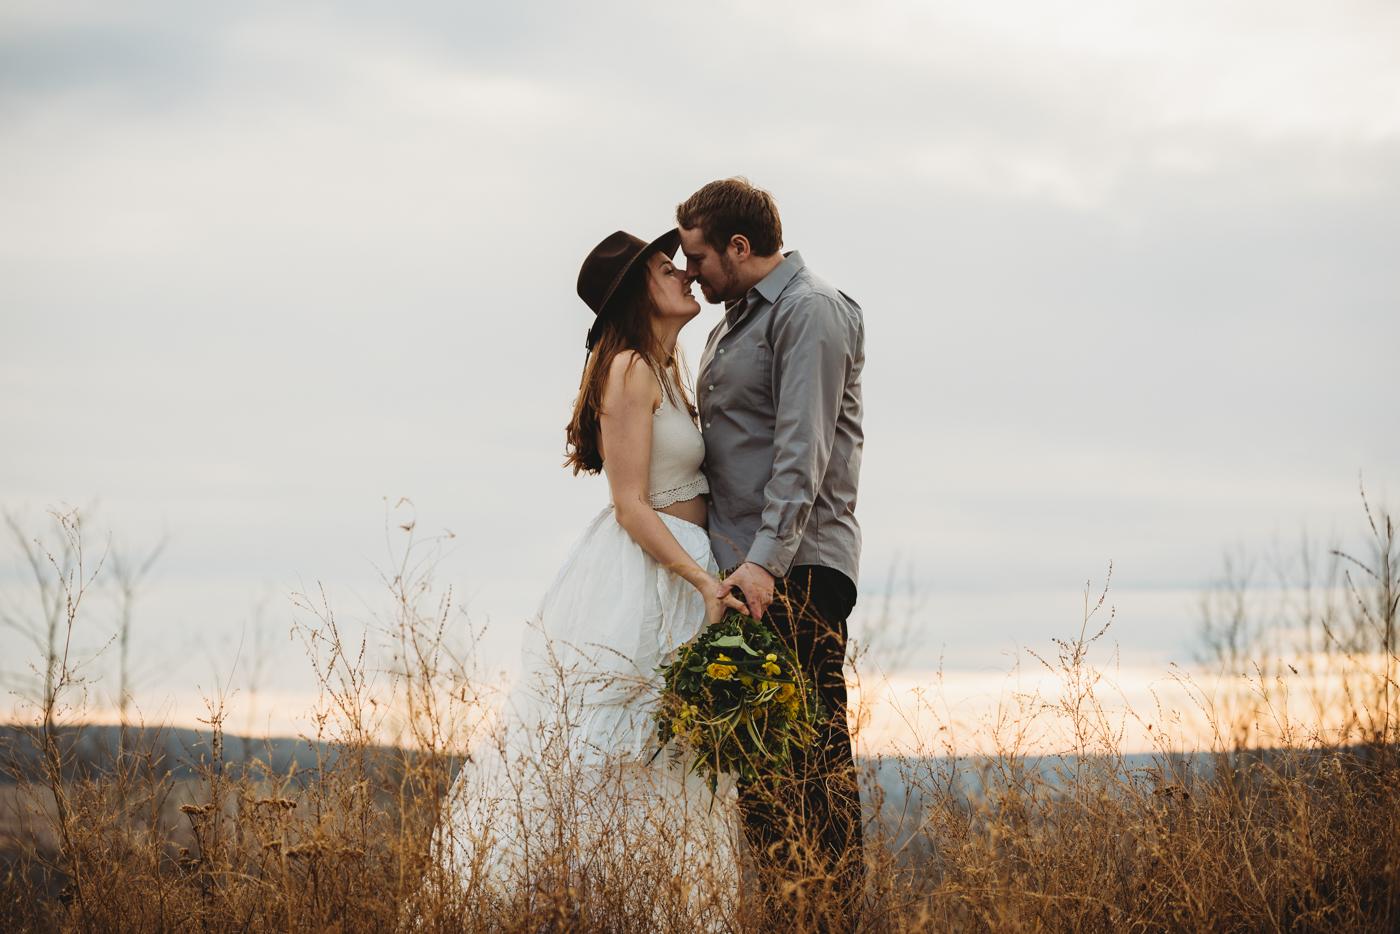 FortSt.John_photographer_TyraEPhotography_Wedding_Couple_Family_Photograhy_DawsonCreek_Elopement_Bride_Boduoir_Portraits-42.jpg